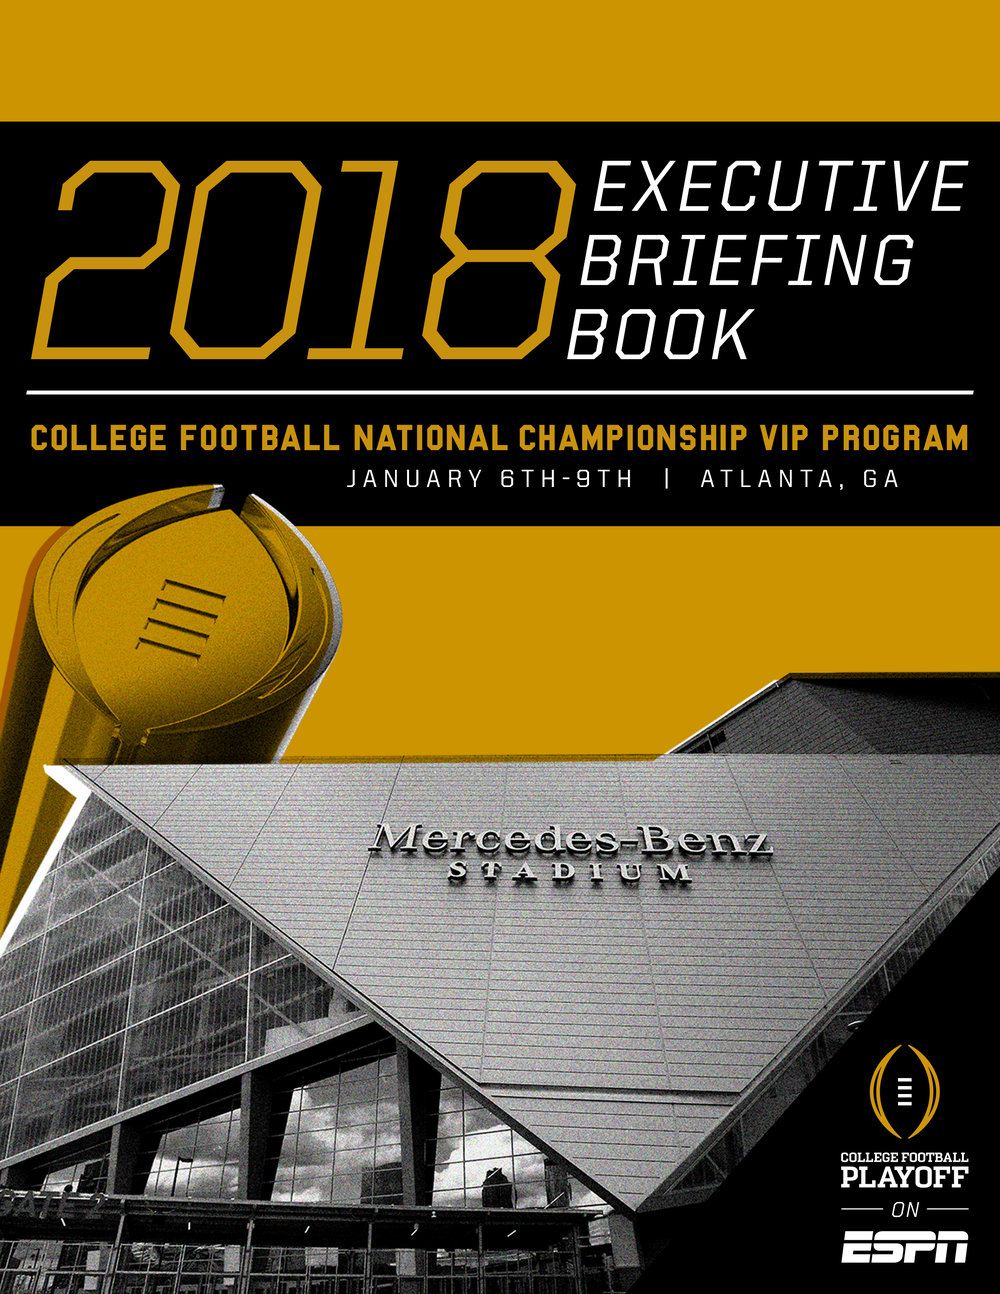 17105264PRO_CFB-ExecutiveBriefingBook_2018_v02.jpg